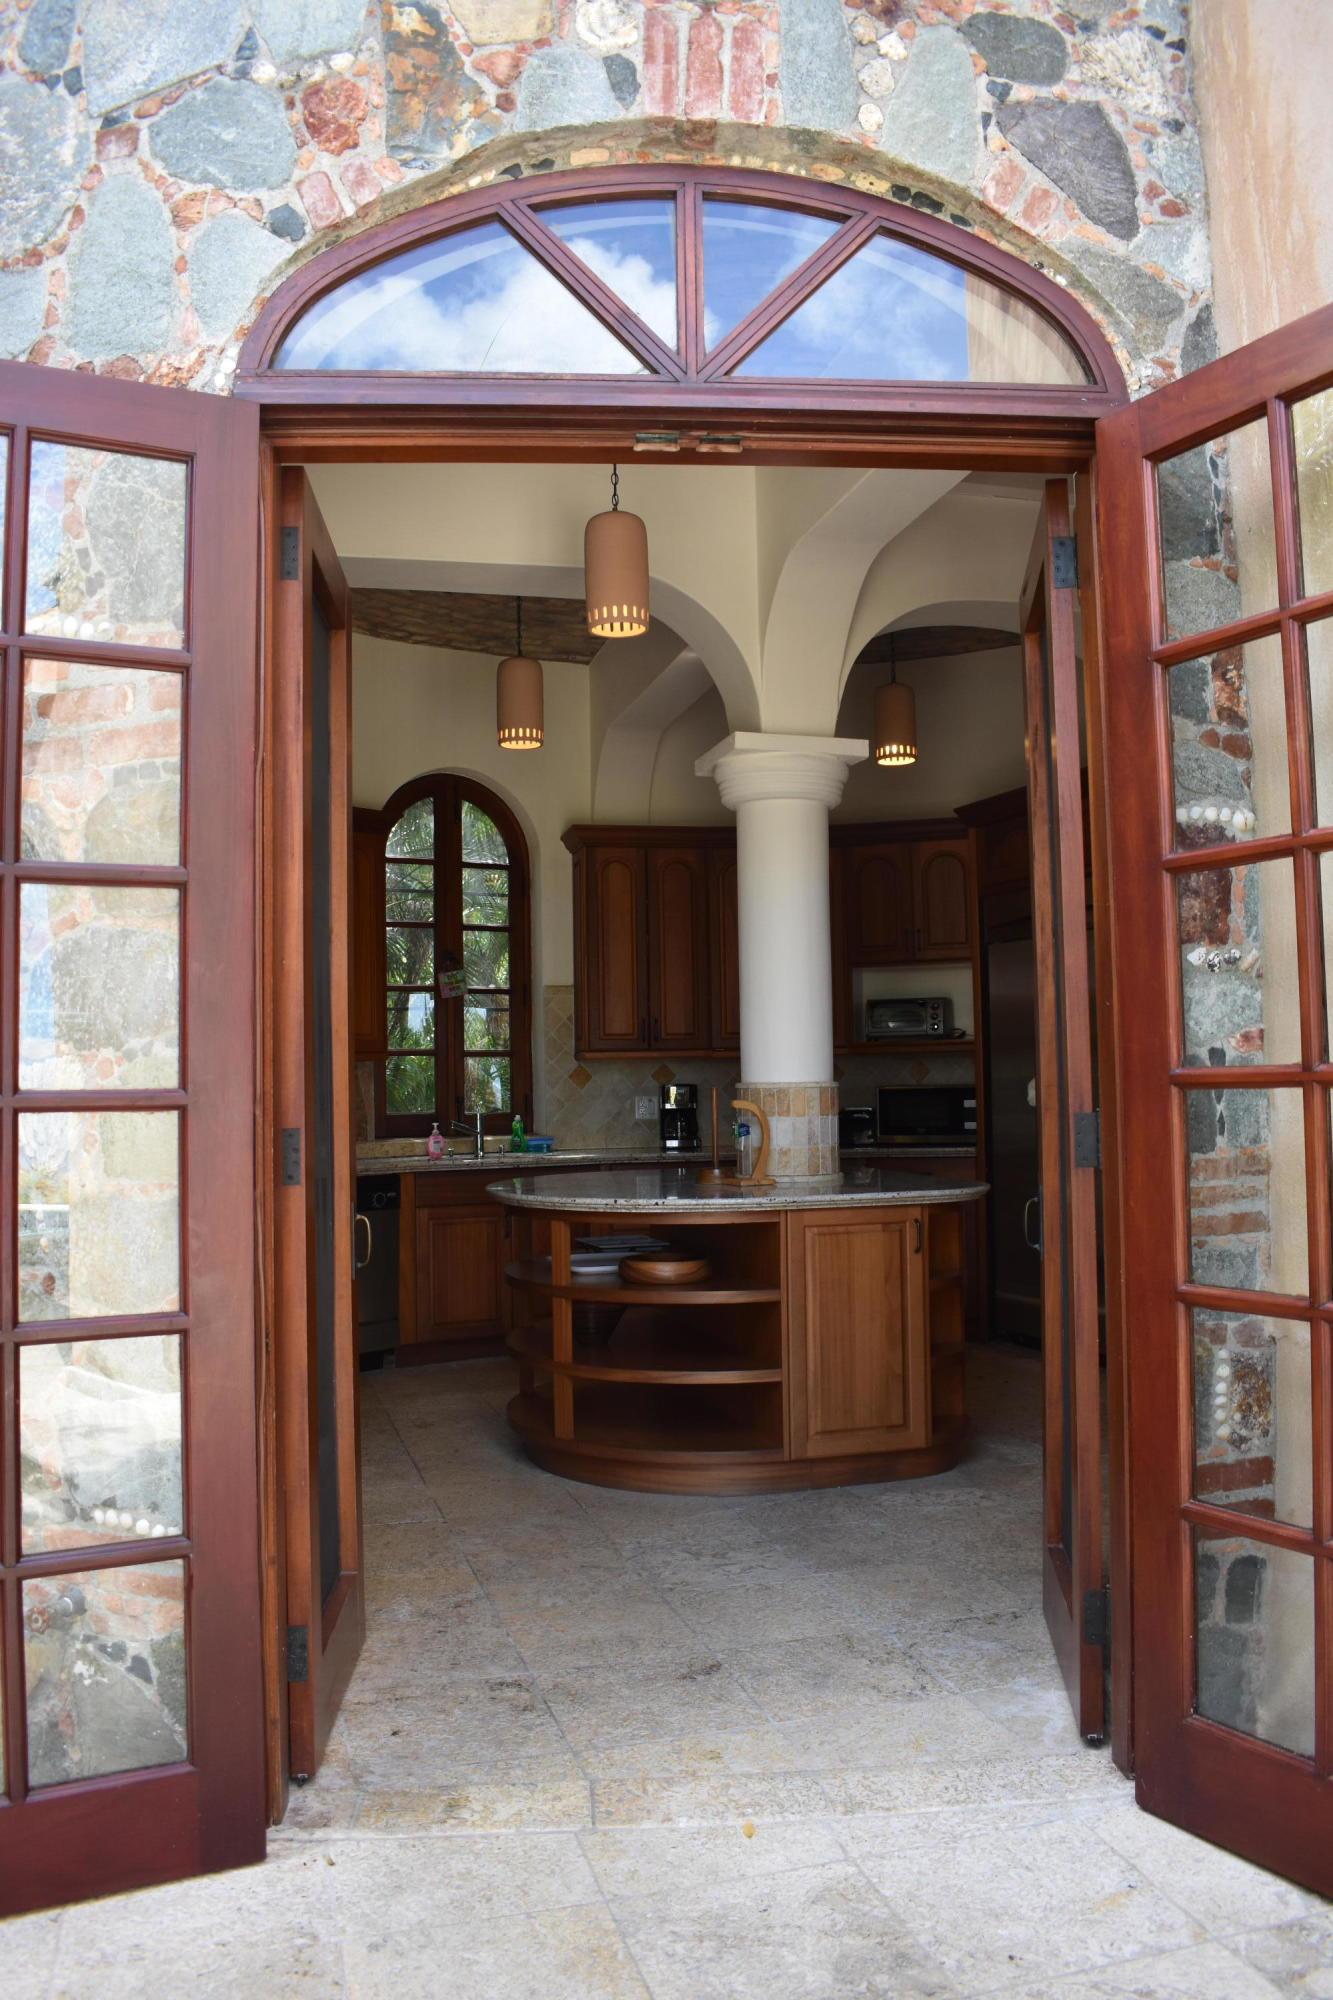 St John, Virgin Islands 00830, 5 Bedrooms Bedrooms, ,4.5 BathroomsBathrooms,Residential,For Sale,13-21